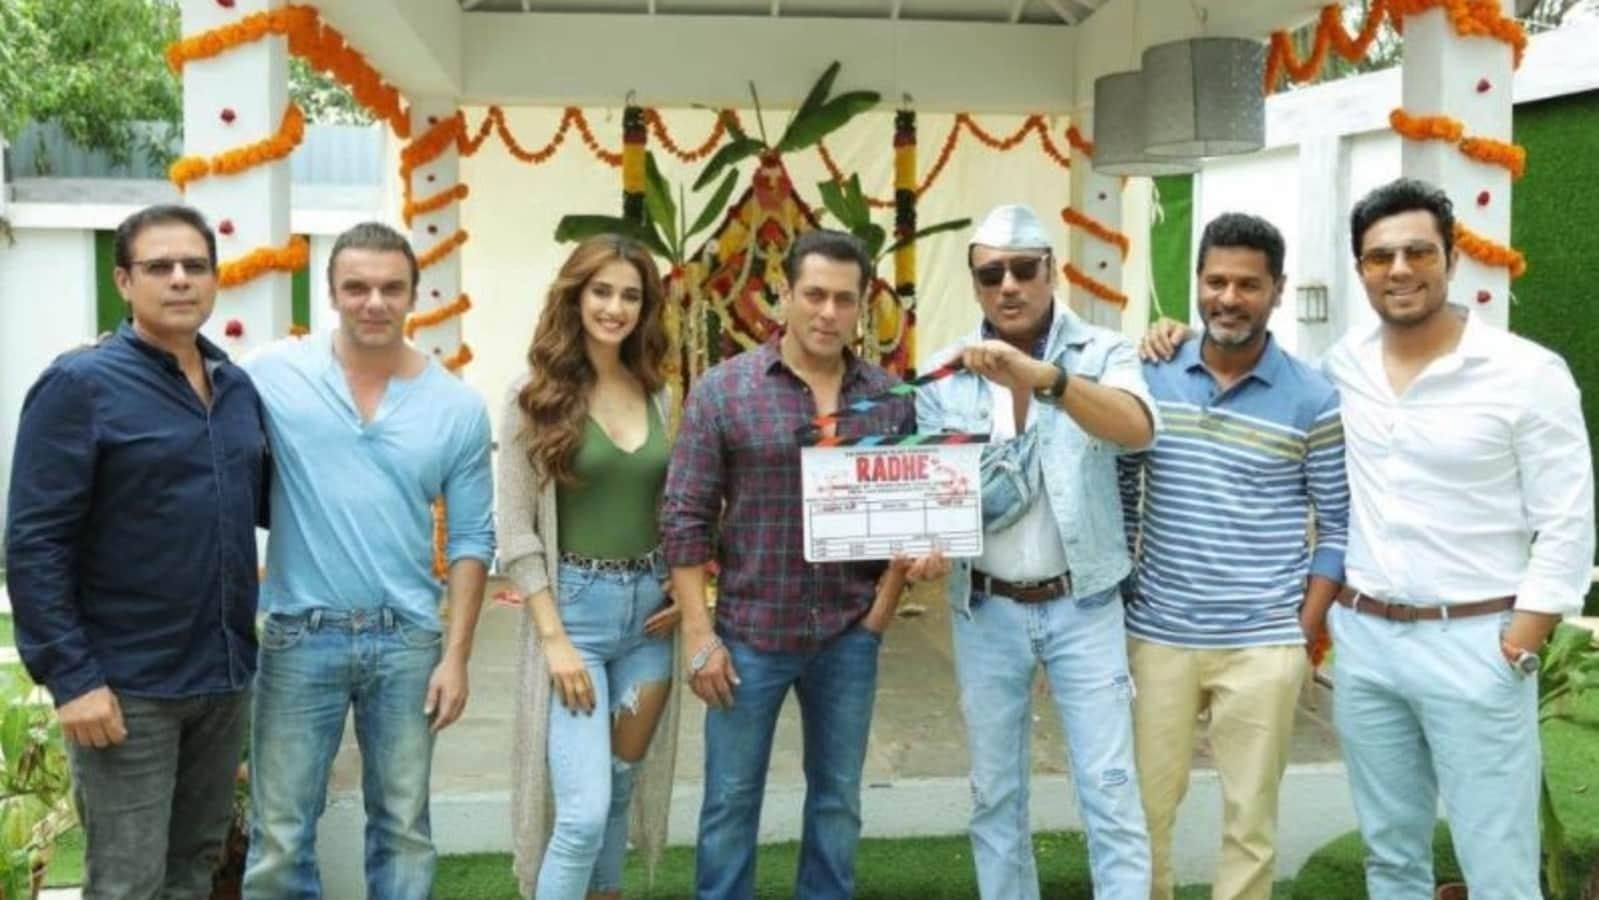 Tiger Shroff praises rumoured girlfriend Disha Patani in Radhe Your Most  Wanted Bhai's trailer: 'Looking great' | Hindustan Times